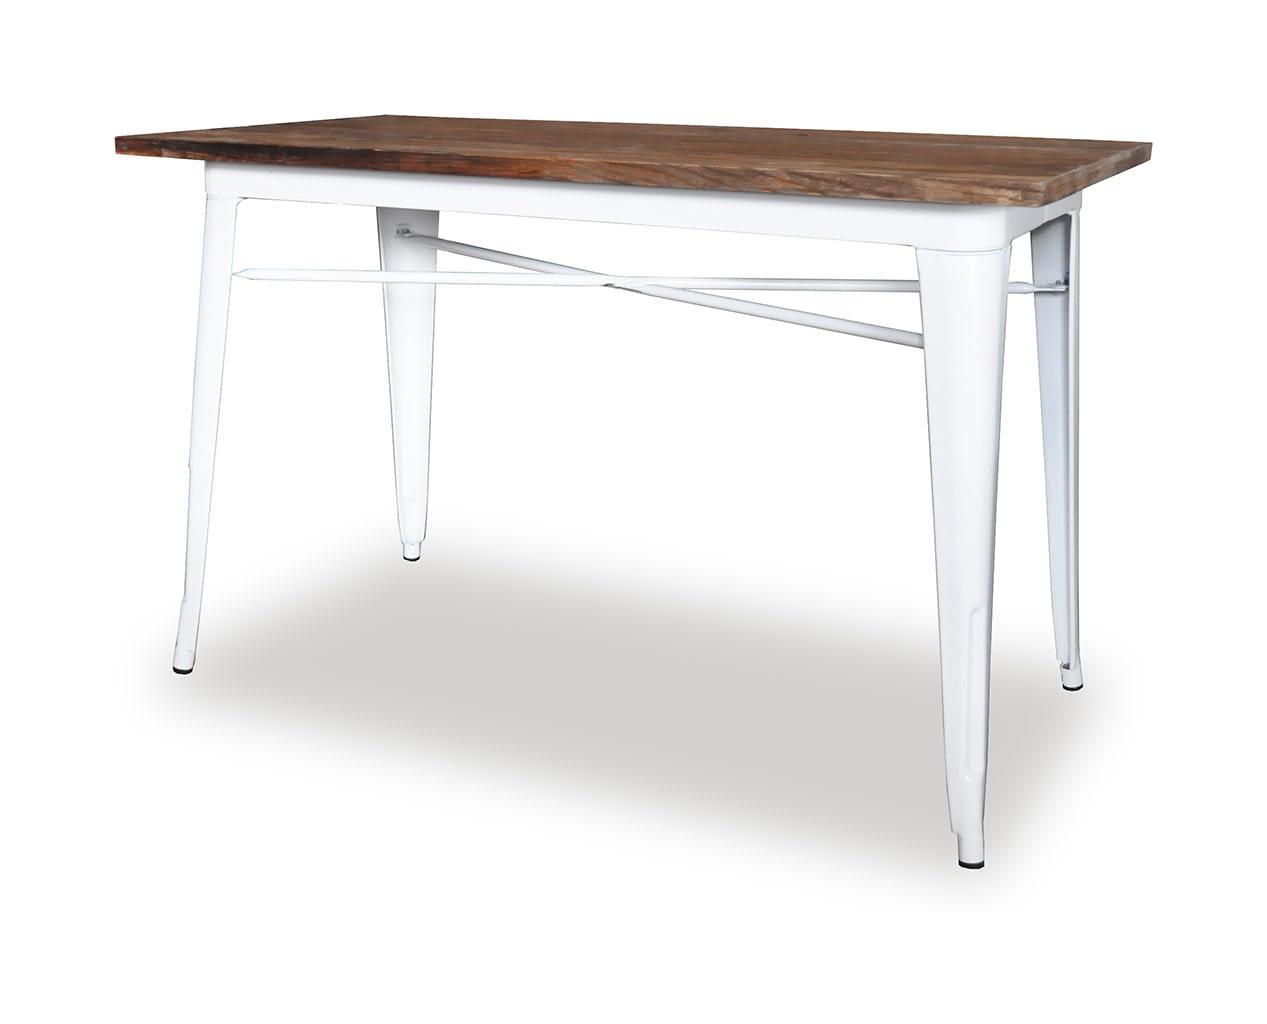 Replica Tolix Wooden Top Table, 120 x 60 x 75cm high, White Legs.